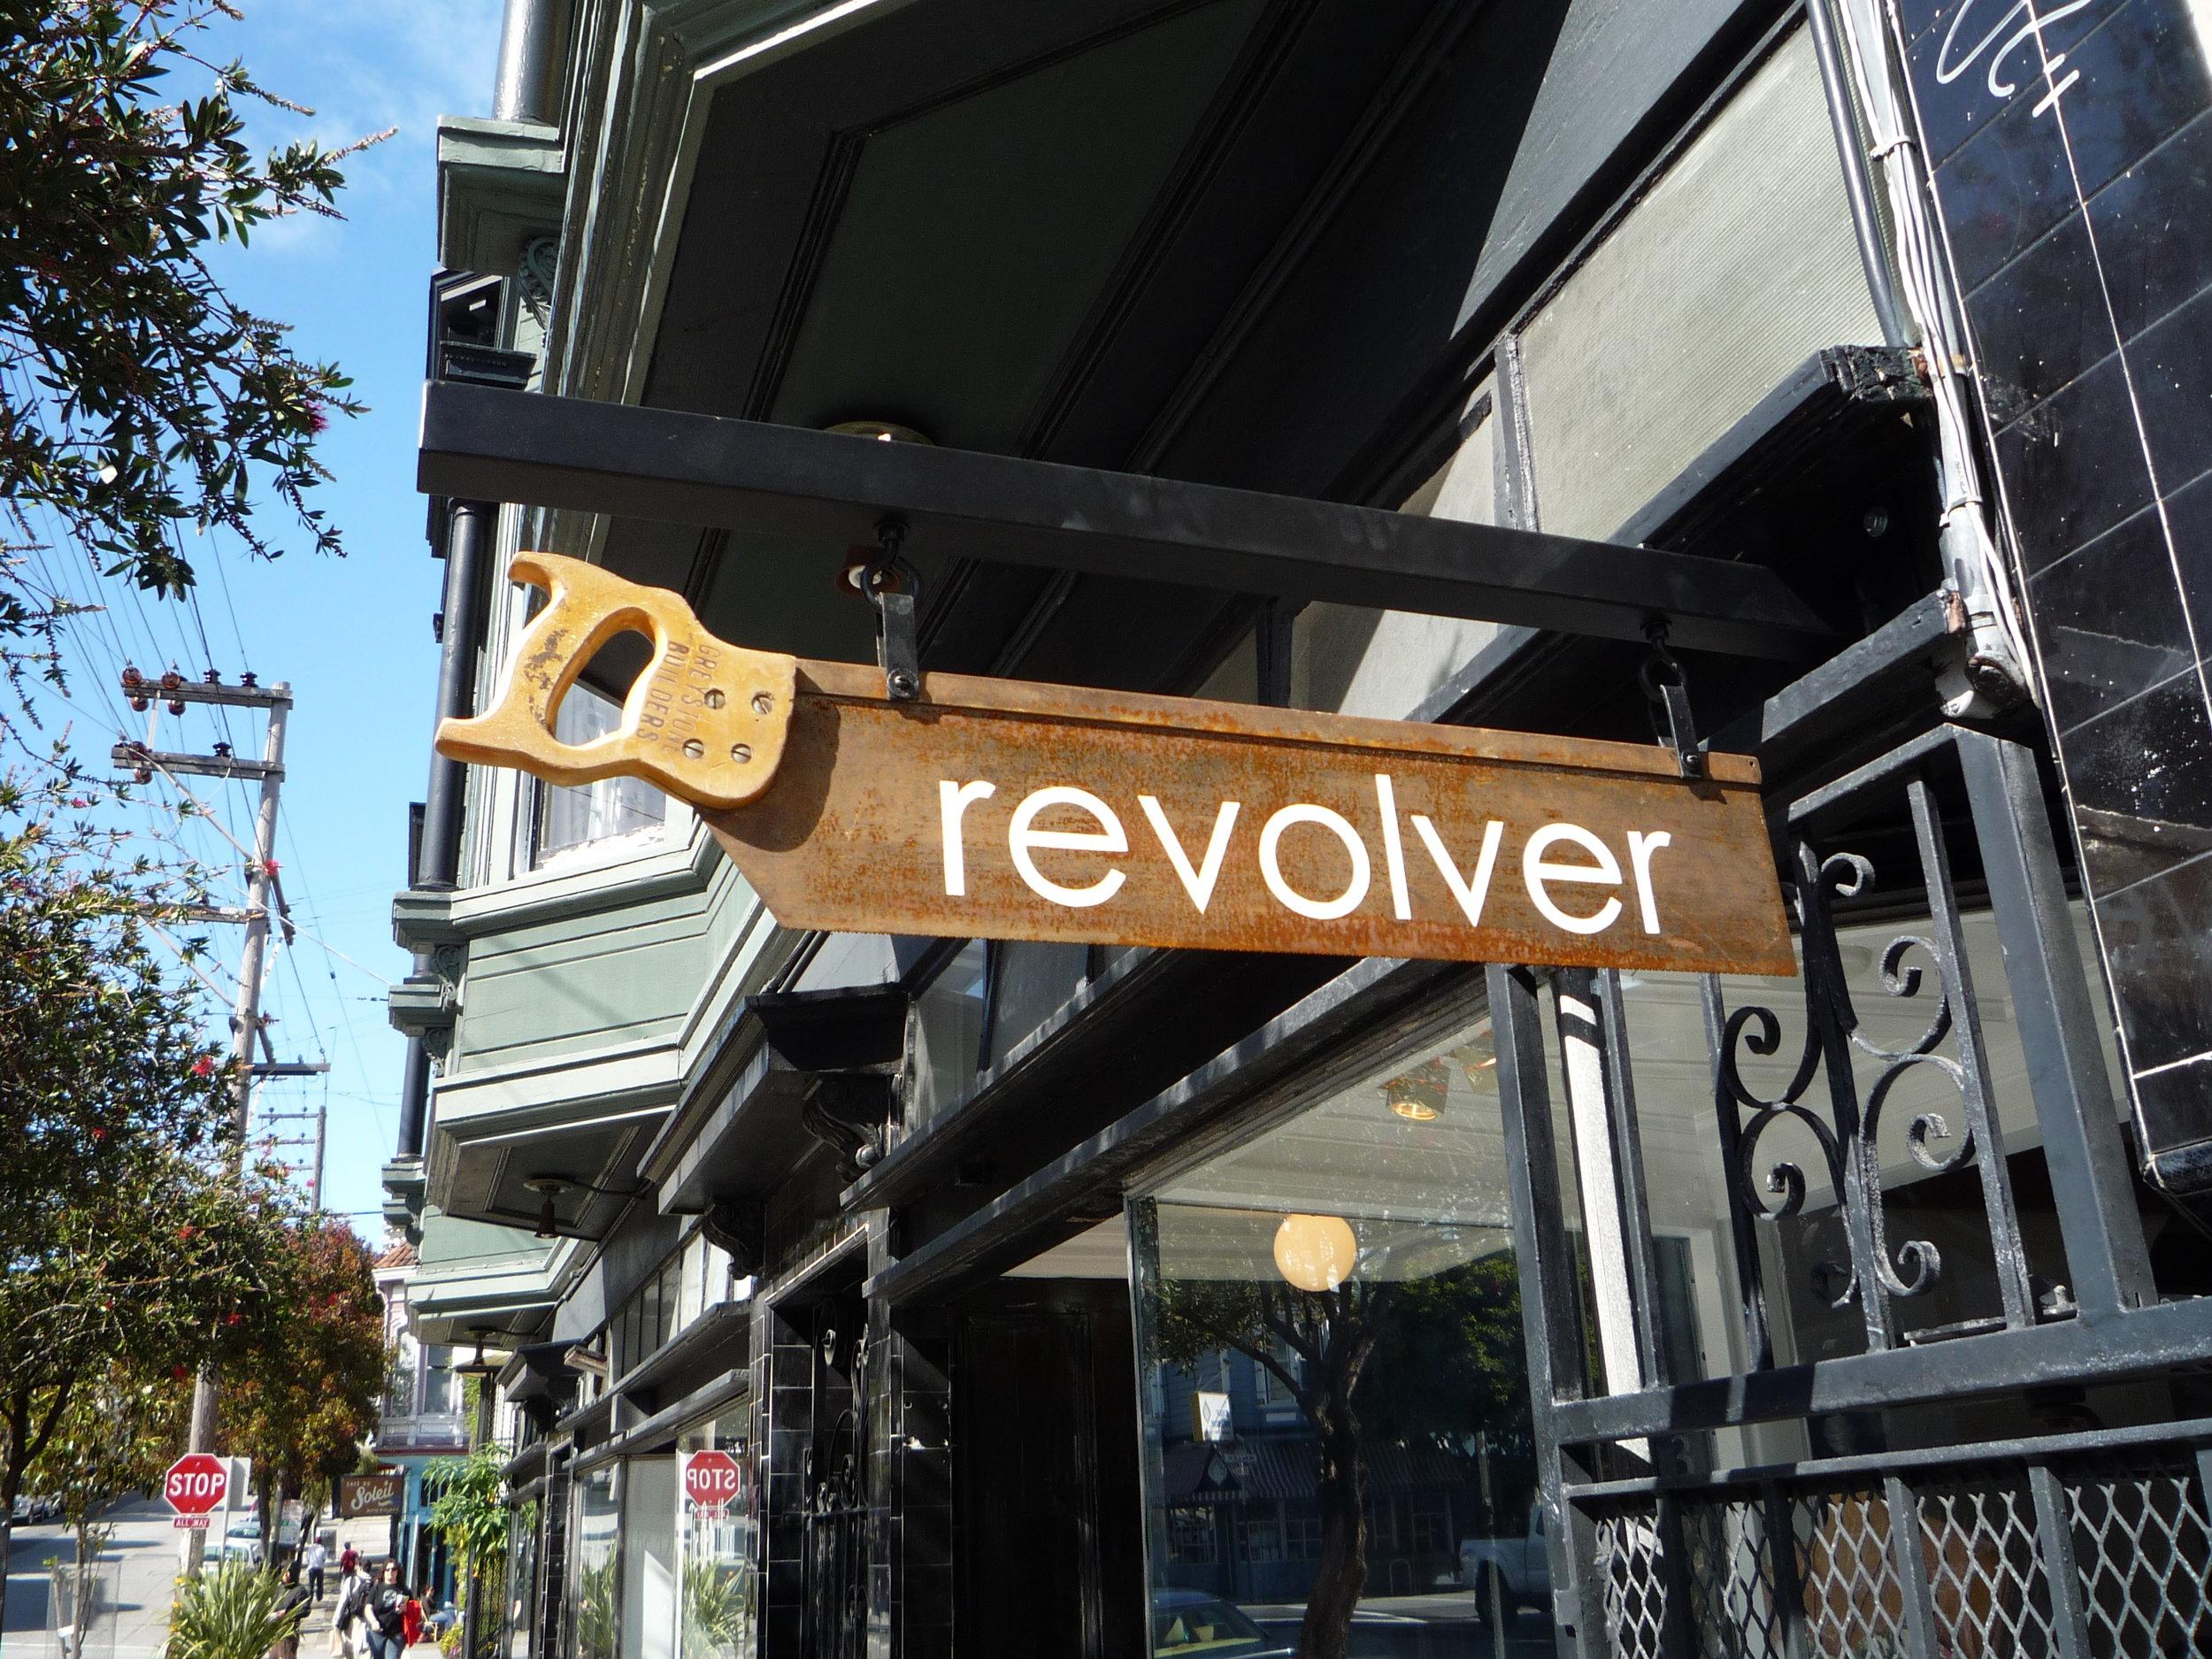 ORIG-revolver-saw_4539152021_o.jpg